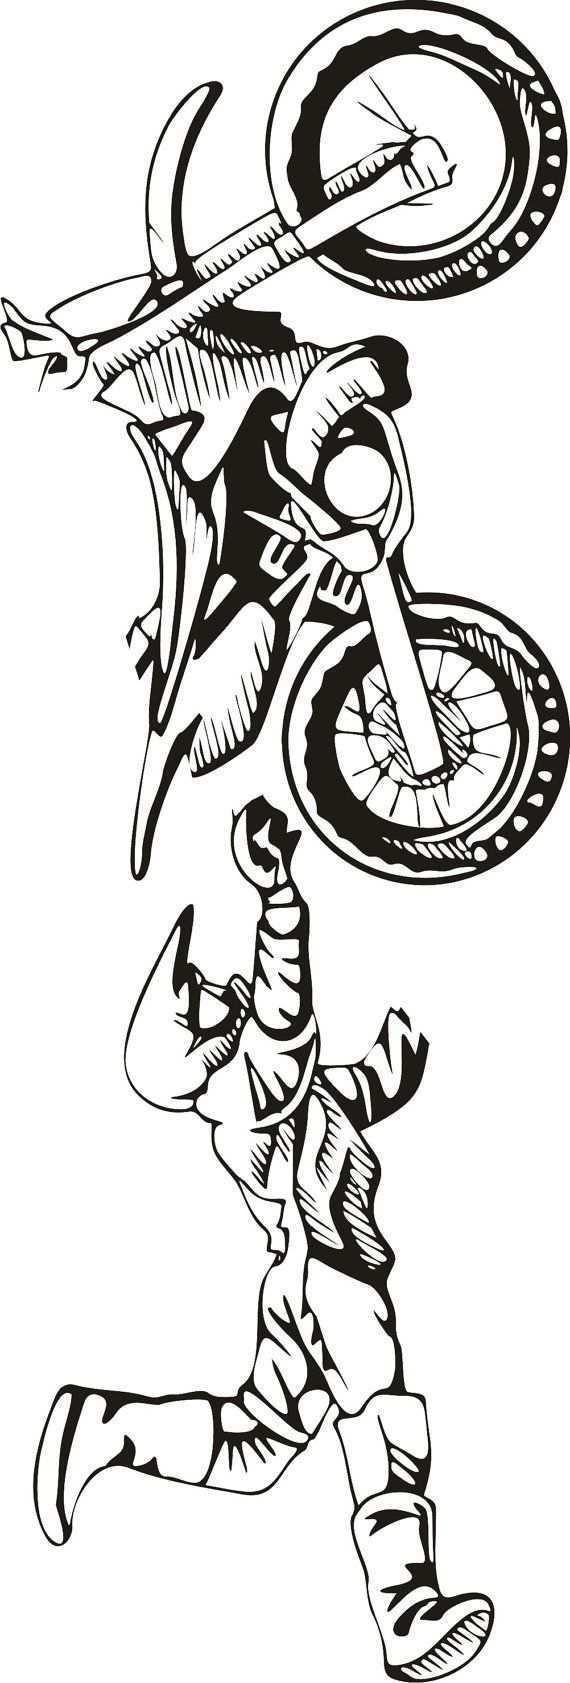 Large Motocross Vinyl Decal Wall Sticker Wall Tattoo Tatuagem Motocross Desenhos De Motocross Adesivos Para Motos